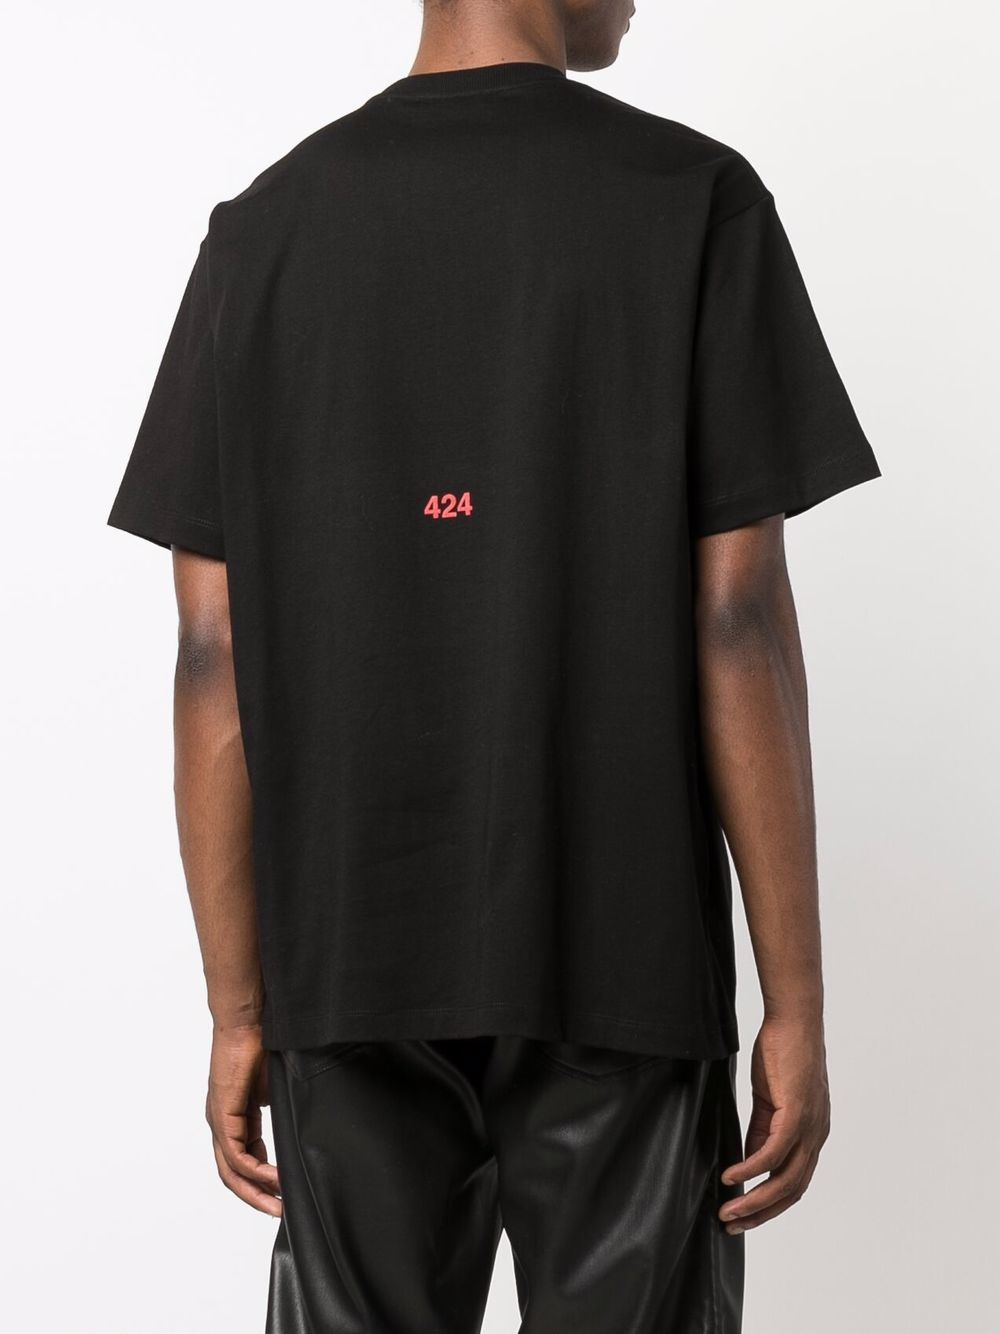 Picture of 424 | Slogan-Print Cotton T-Shirt